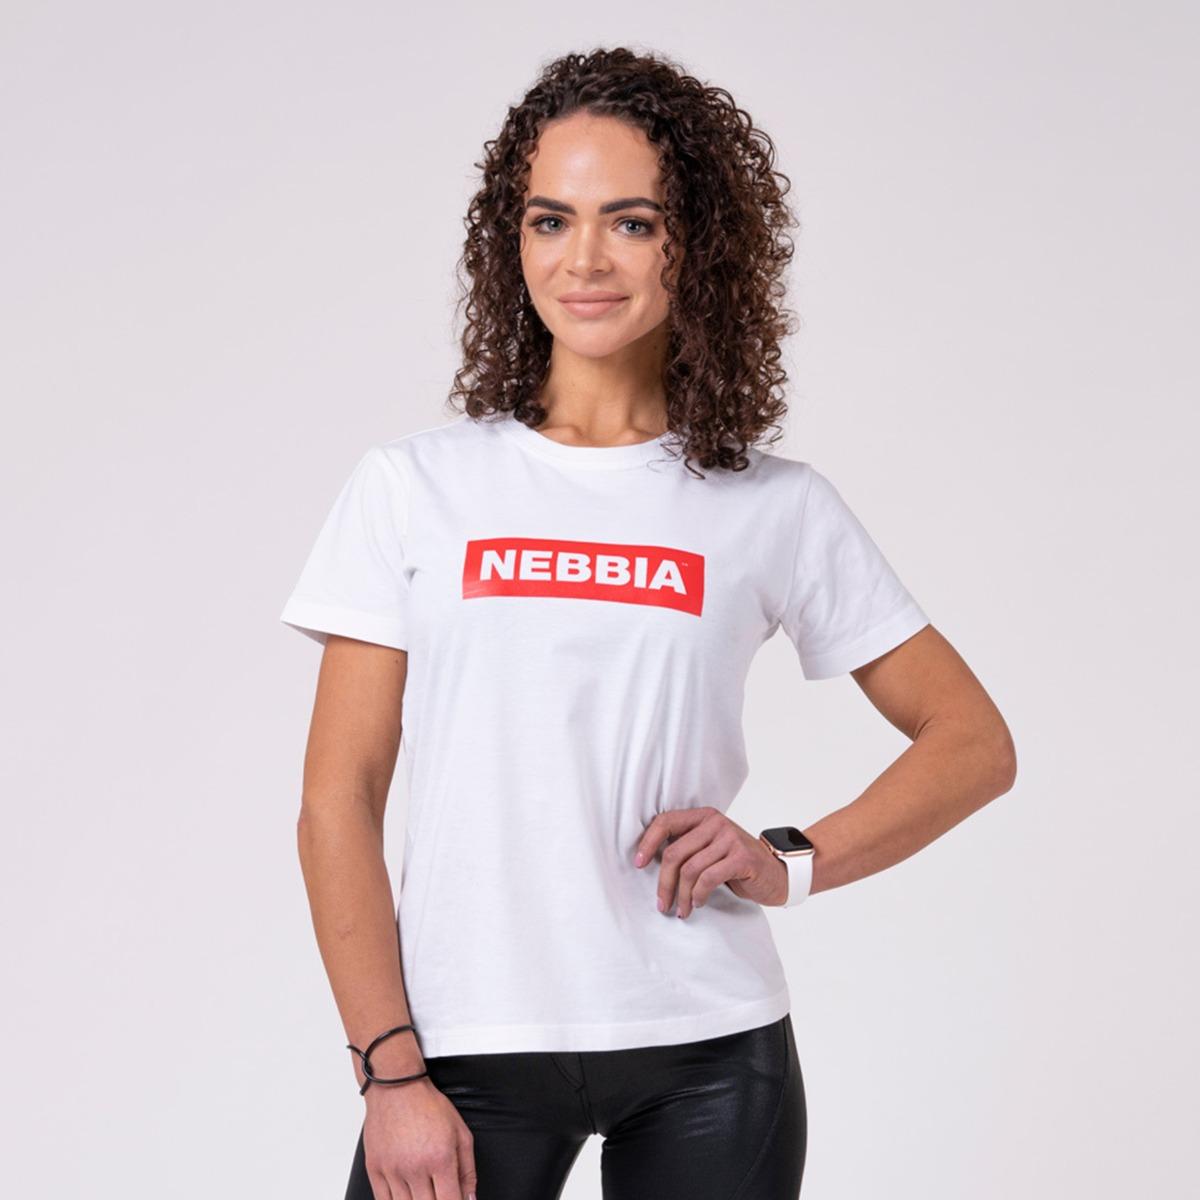 Dámské tričko Basic White - NEBBIA